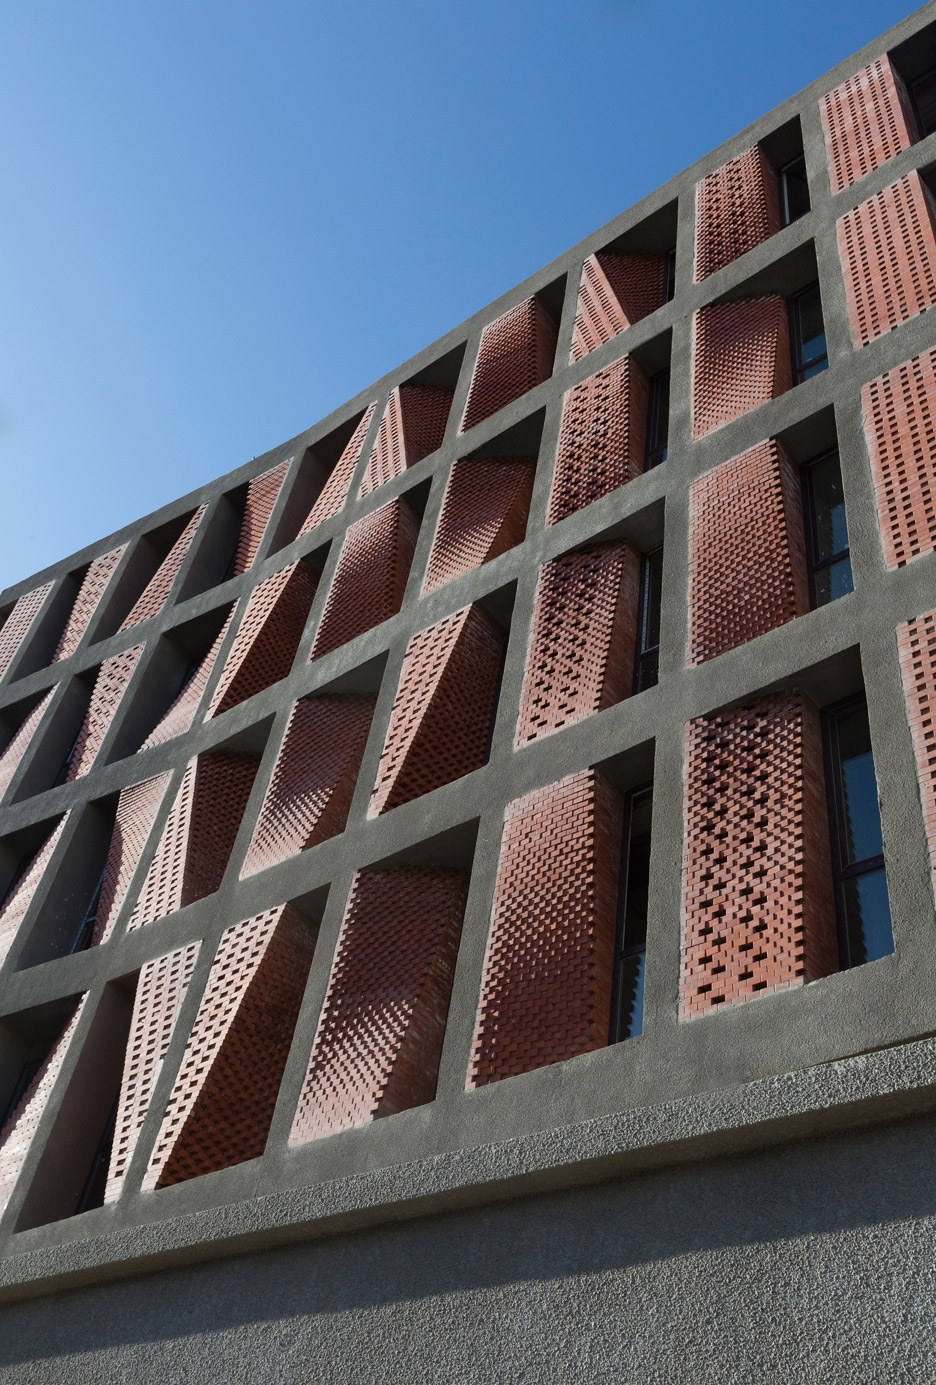 kahrizak-residential-building-caat-studio-tehran-iran-parham-taghioff_dezeen_936_1